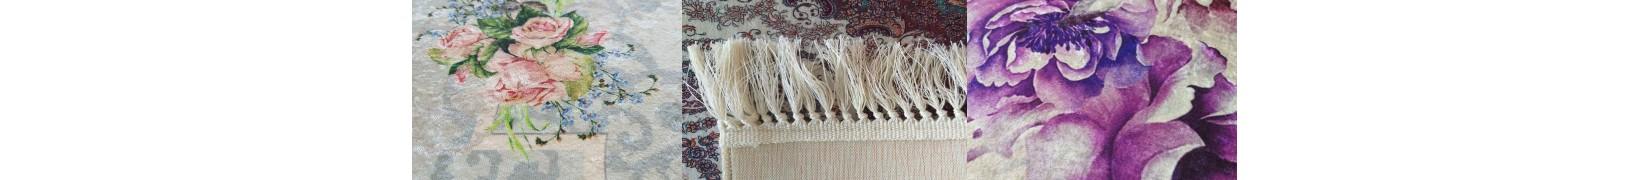 Dywany klasczne i nowoczene, multikolorowe HORECA